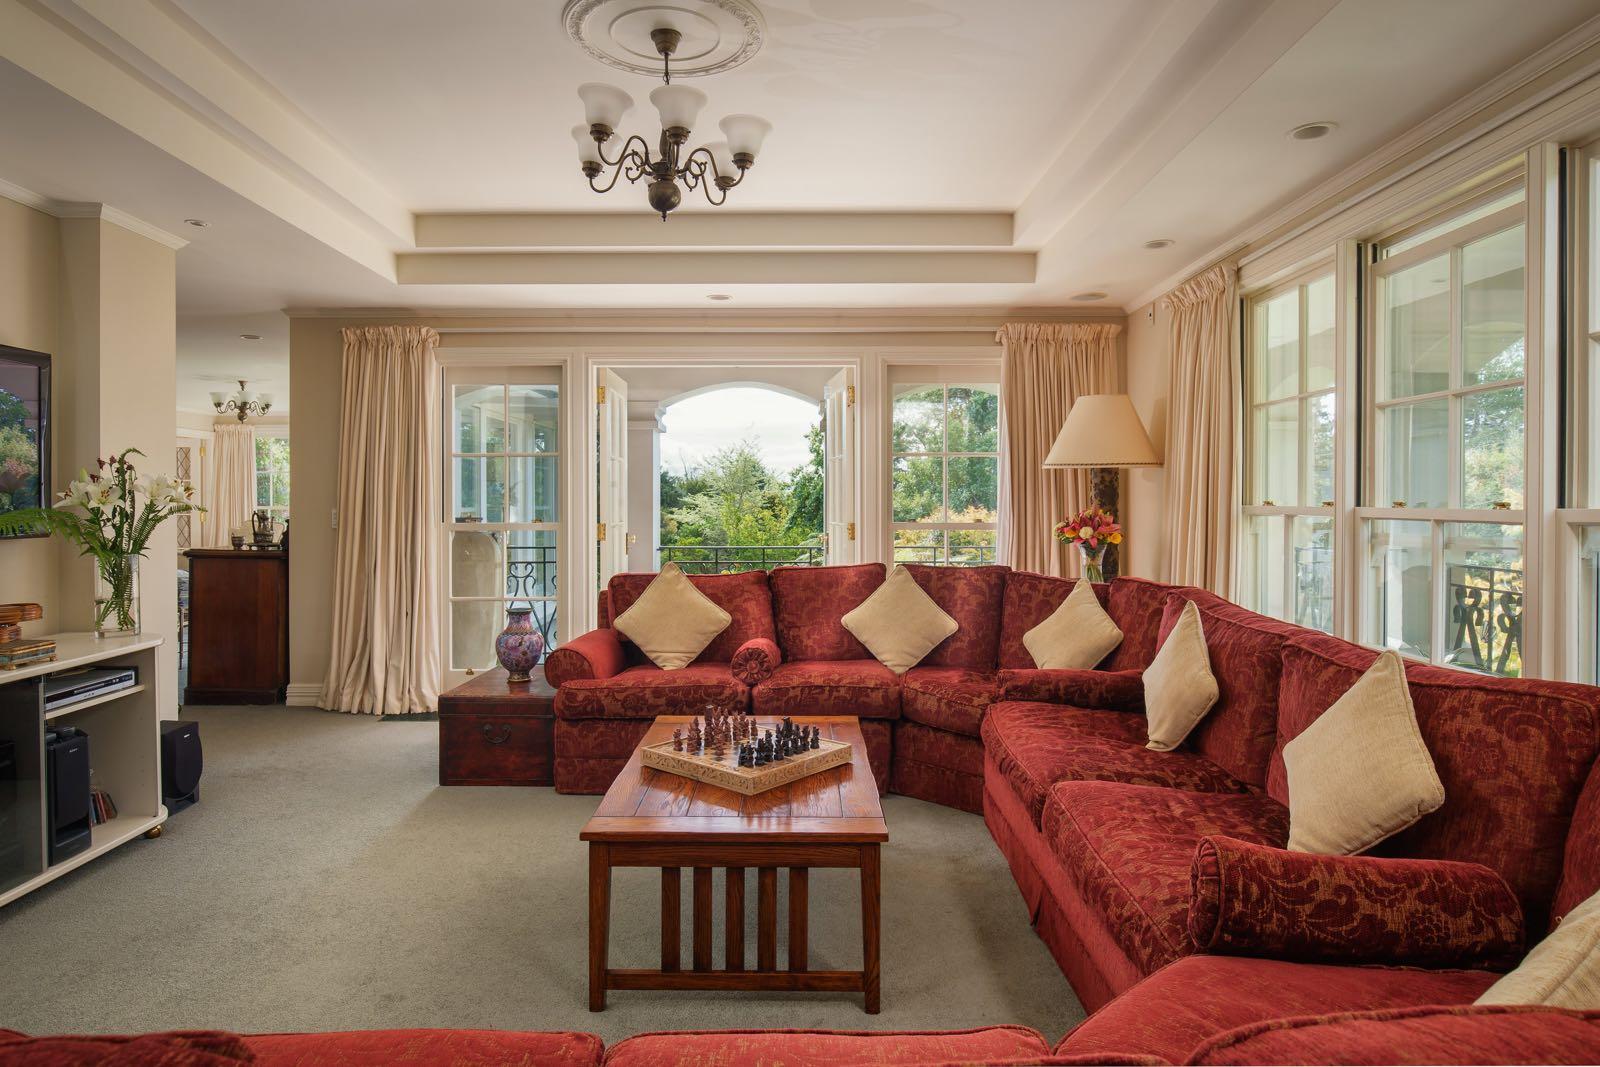 luxury accommodation nz